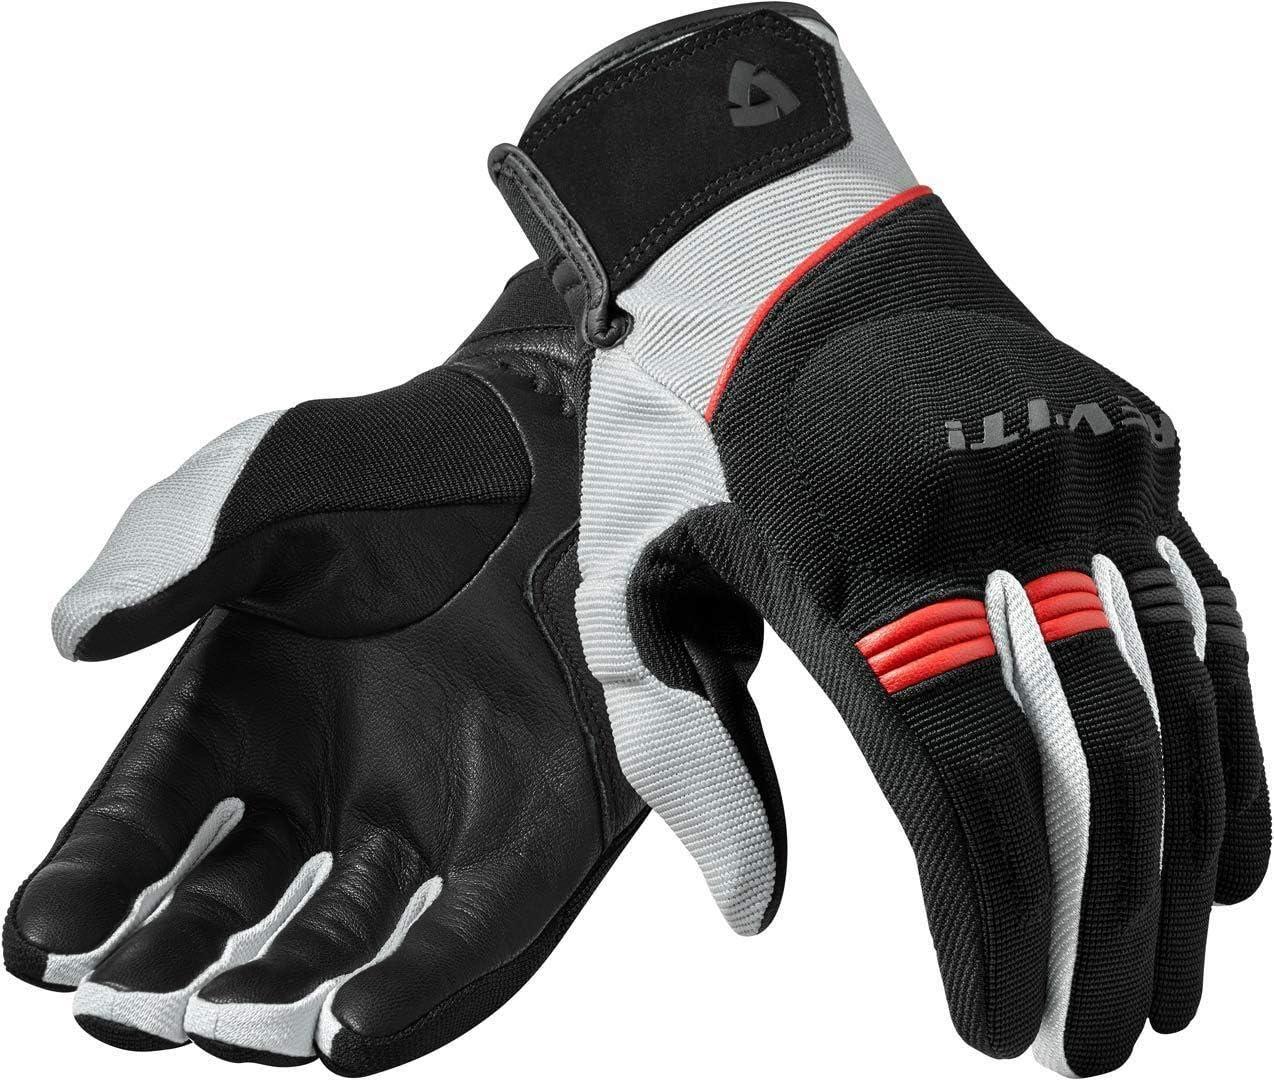 Revit Mosca Motocross Handschuhe Schwarz Rot Xl Auto